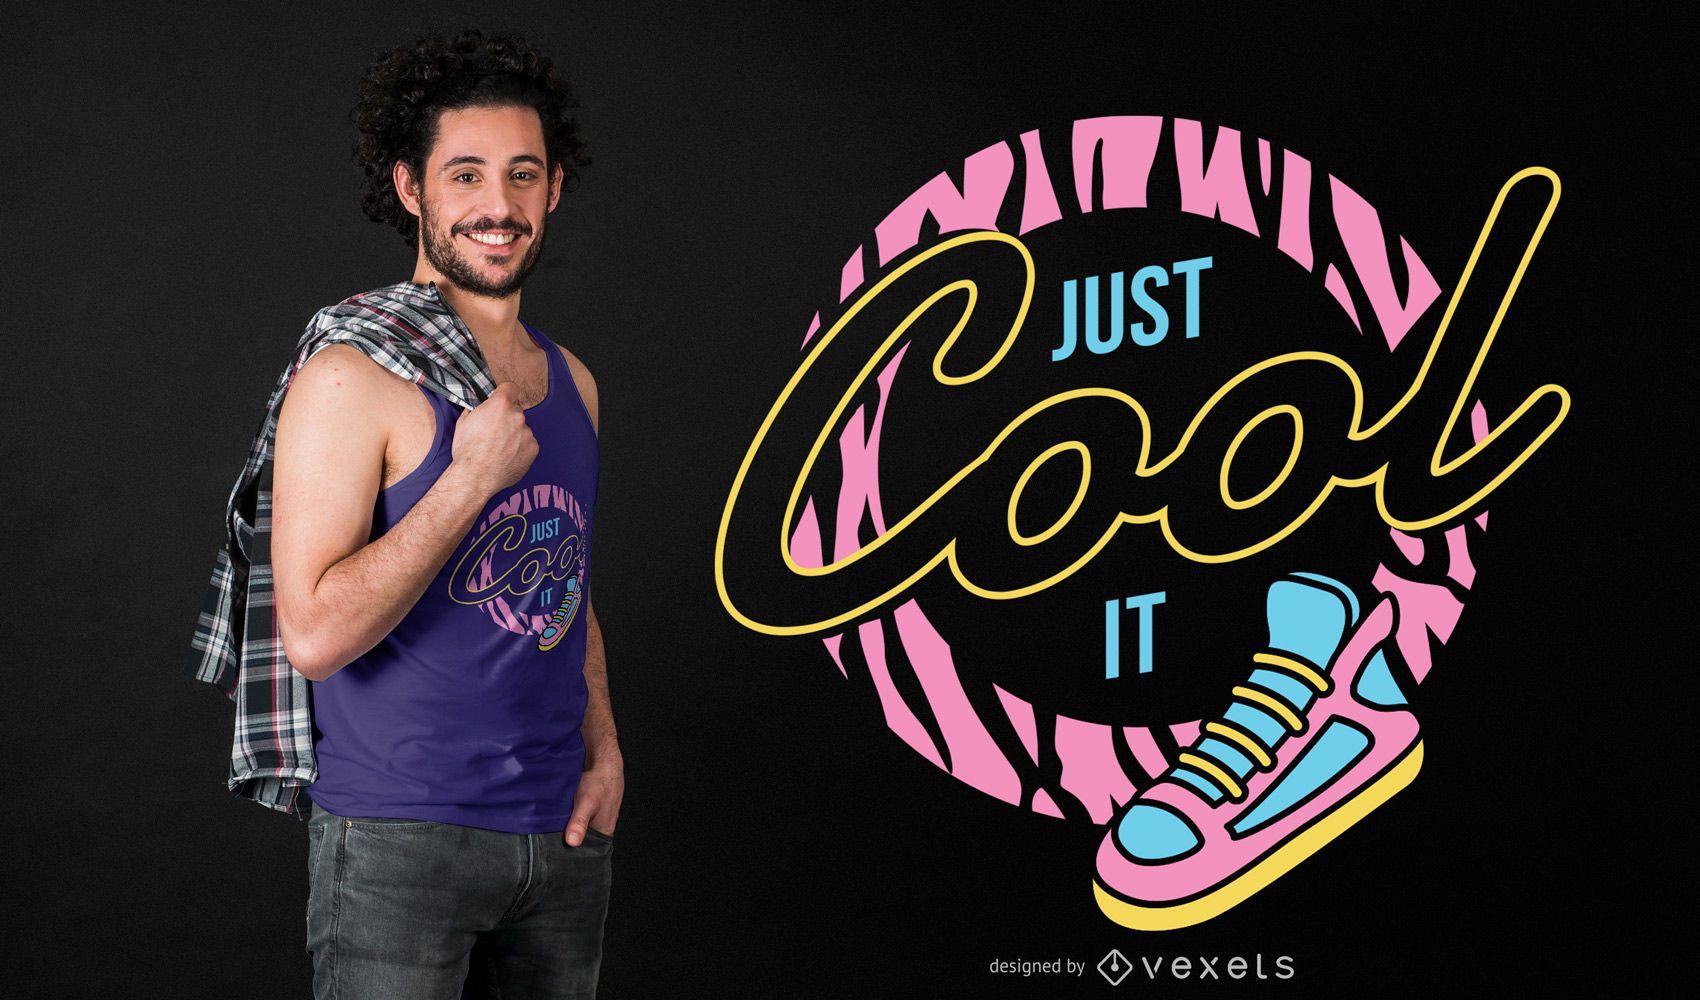 Just cool it t-shirt design